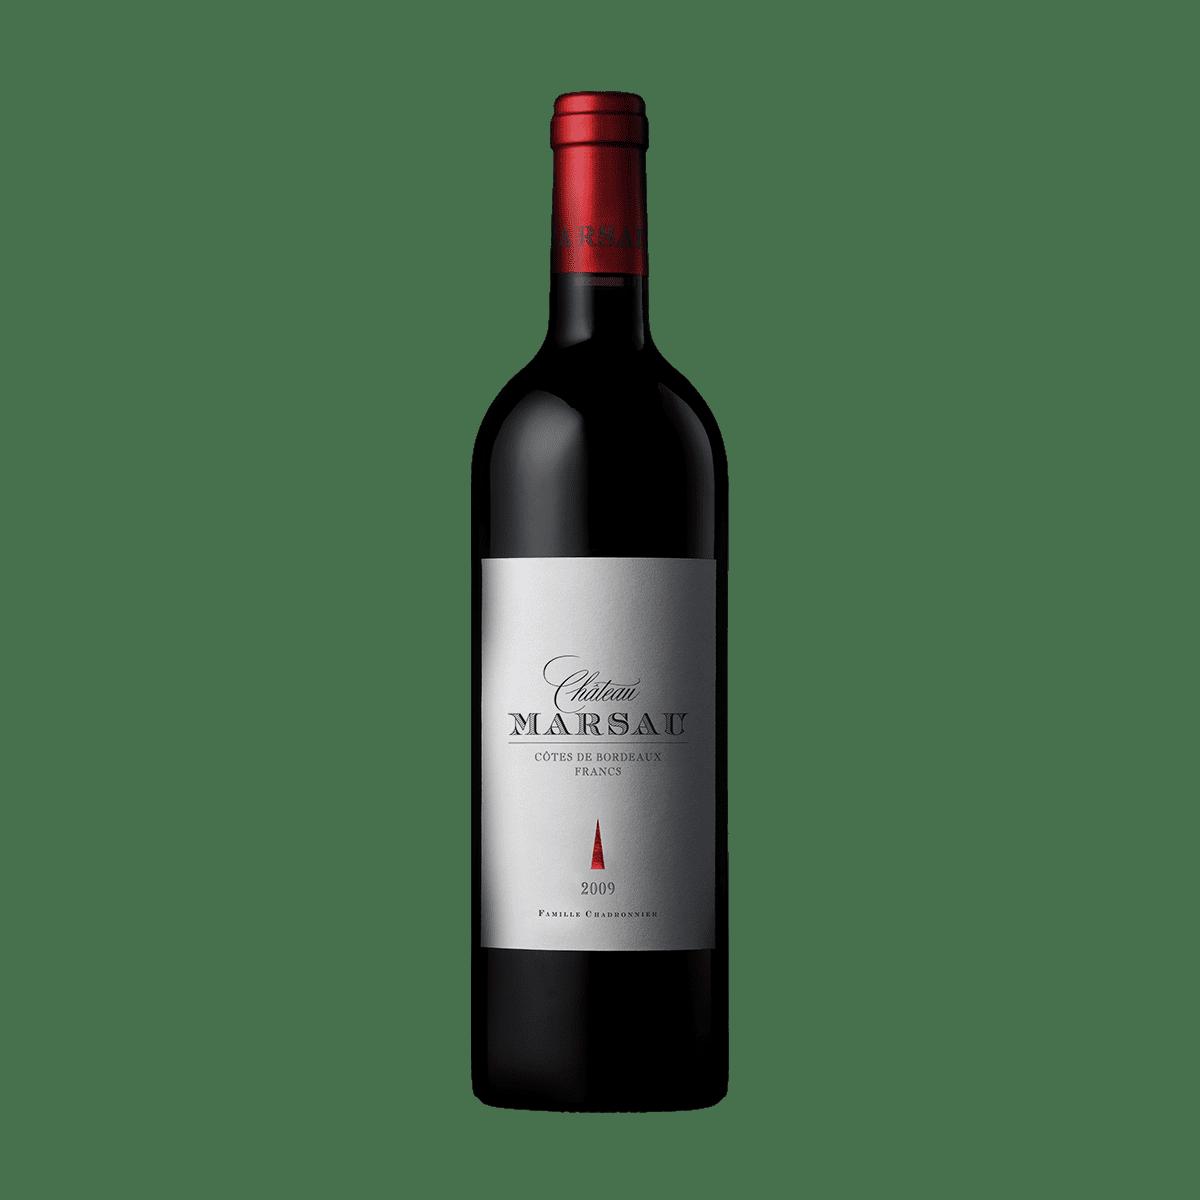 Rượu vang Chateau Marsau